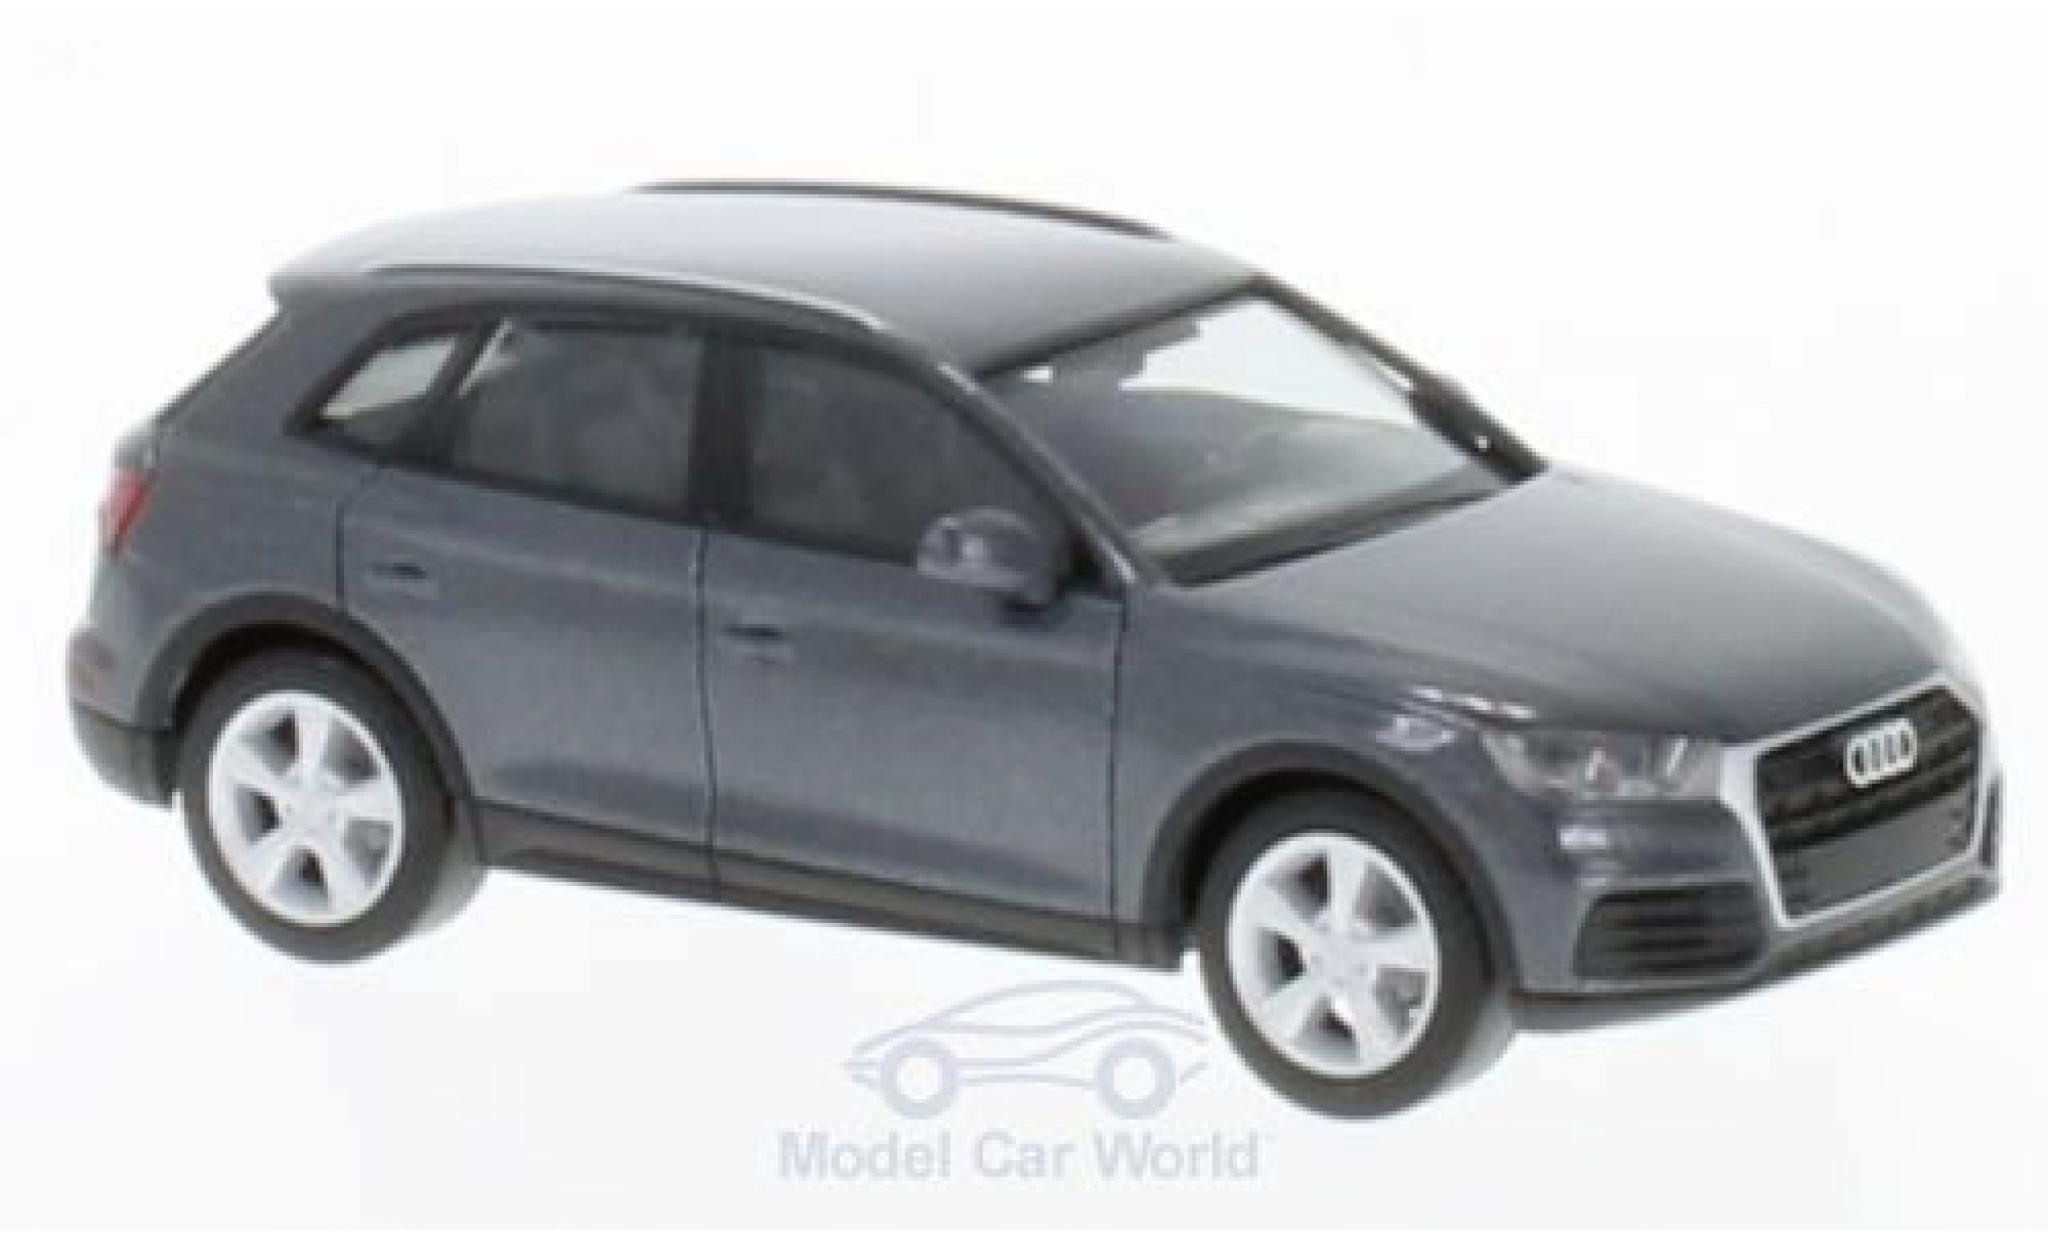 Audi Q5 1/87 Herpa metallise grise